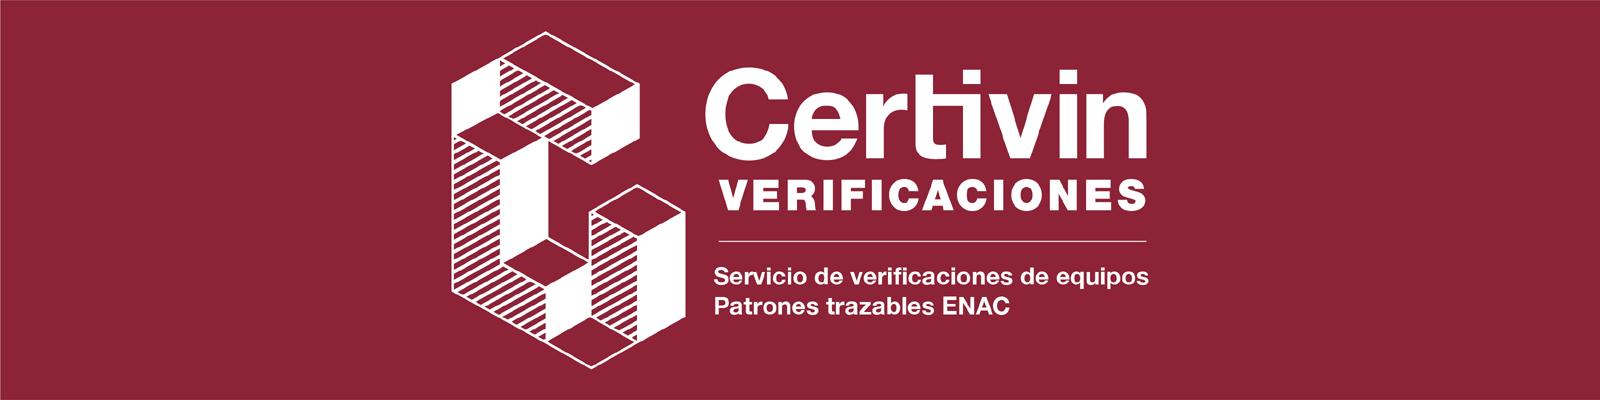 Certivin verificaciones